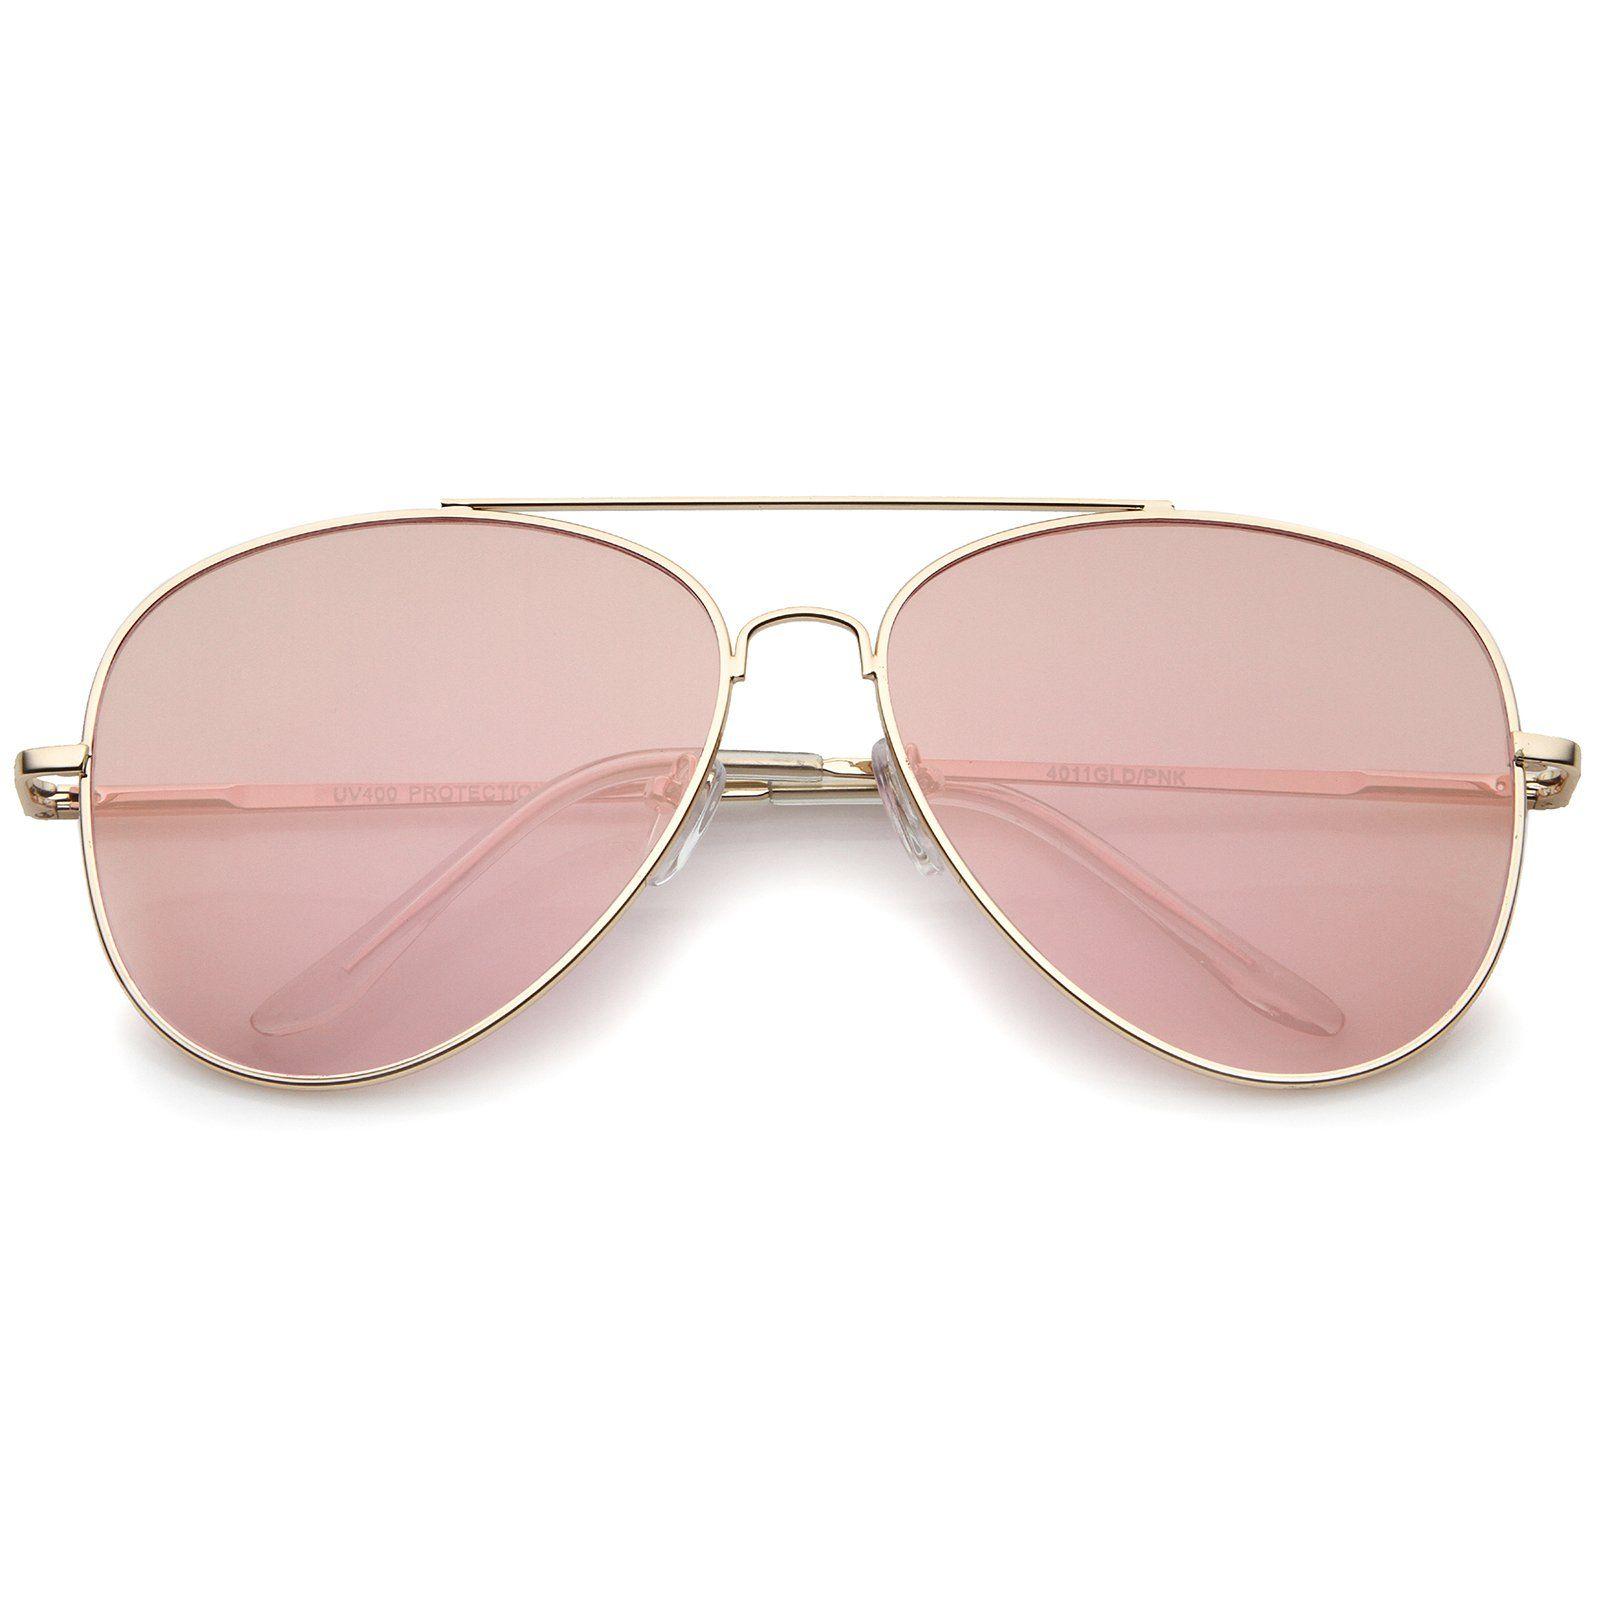 e368b1550f6 Large Metal Rose Gold Frame Pink Mirror Flat Lens Aviator Sunglasses 60mm